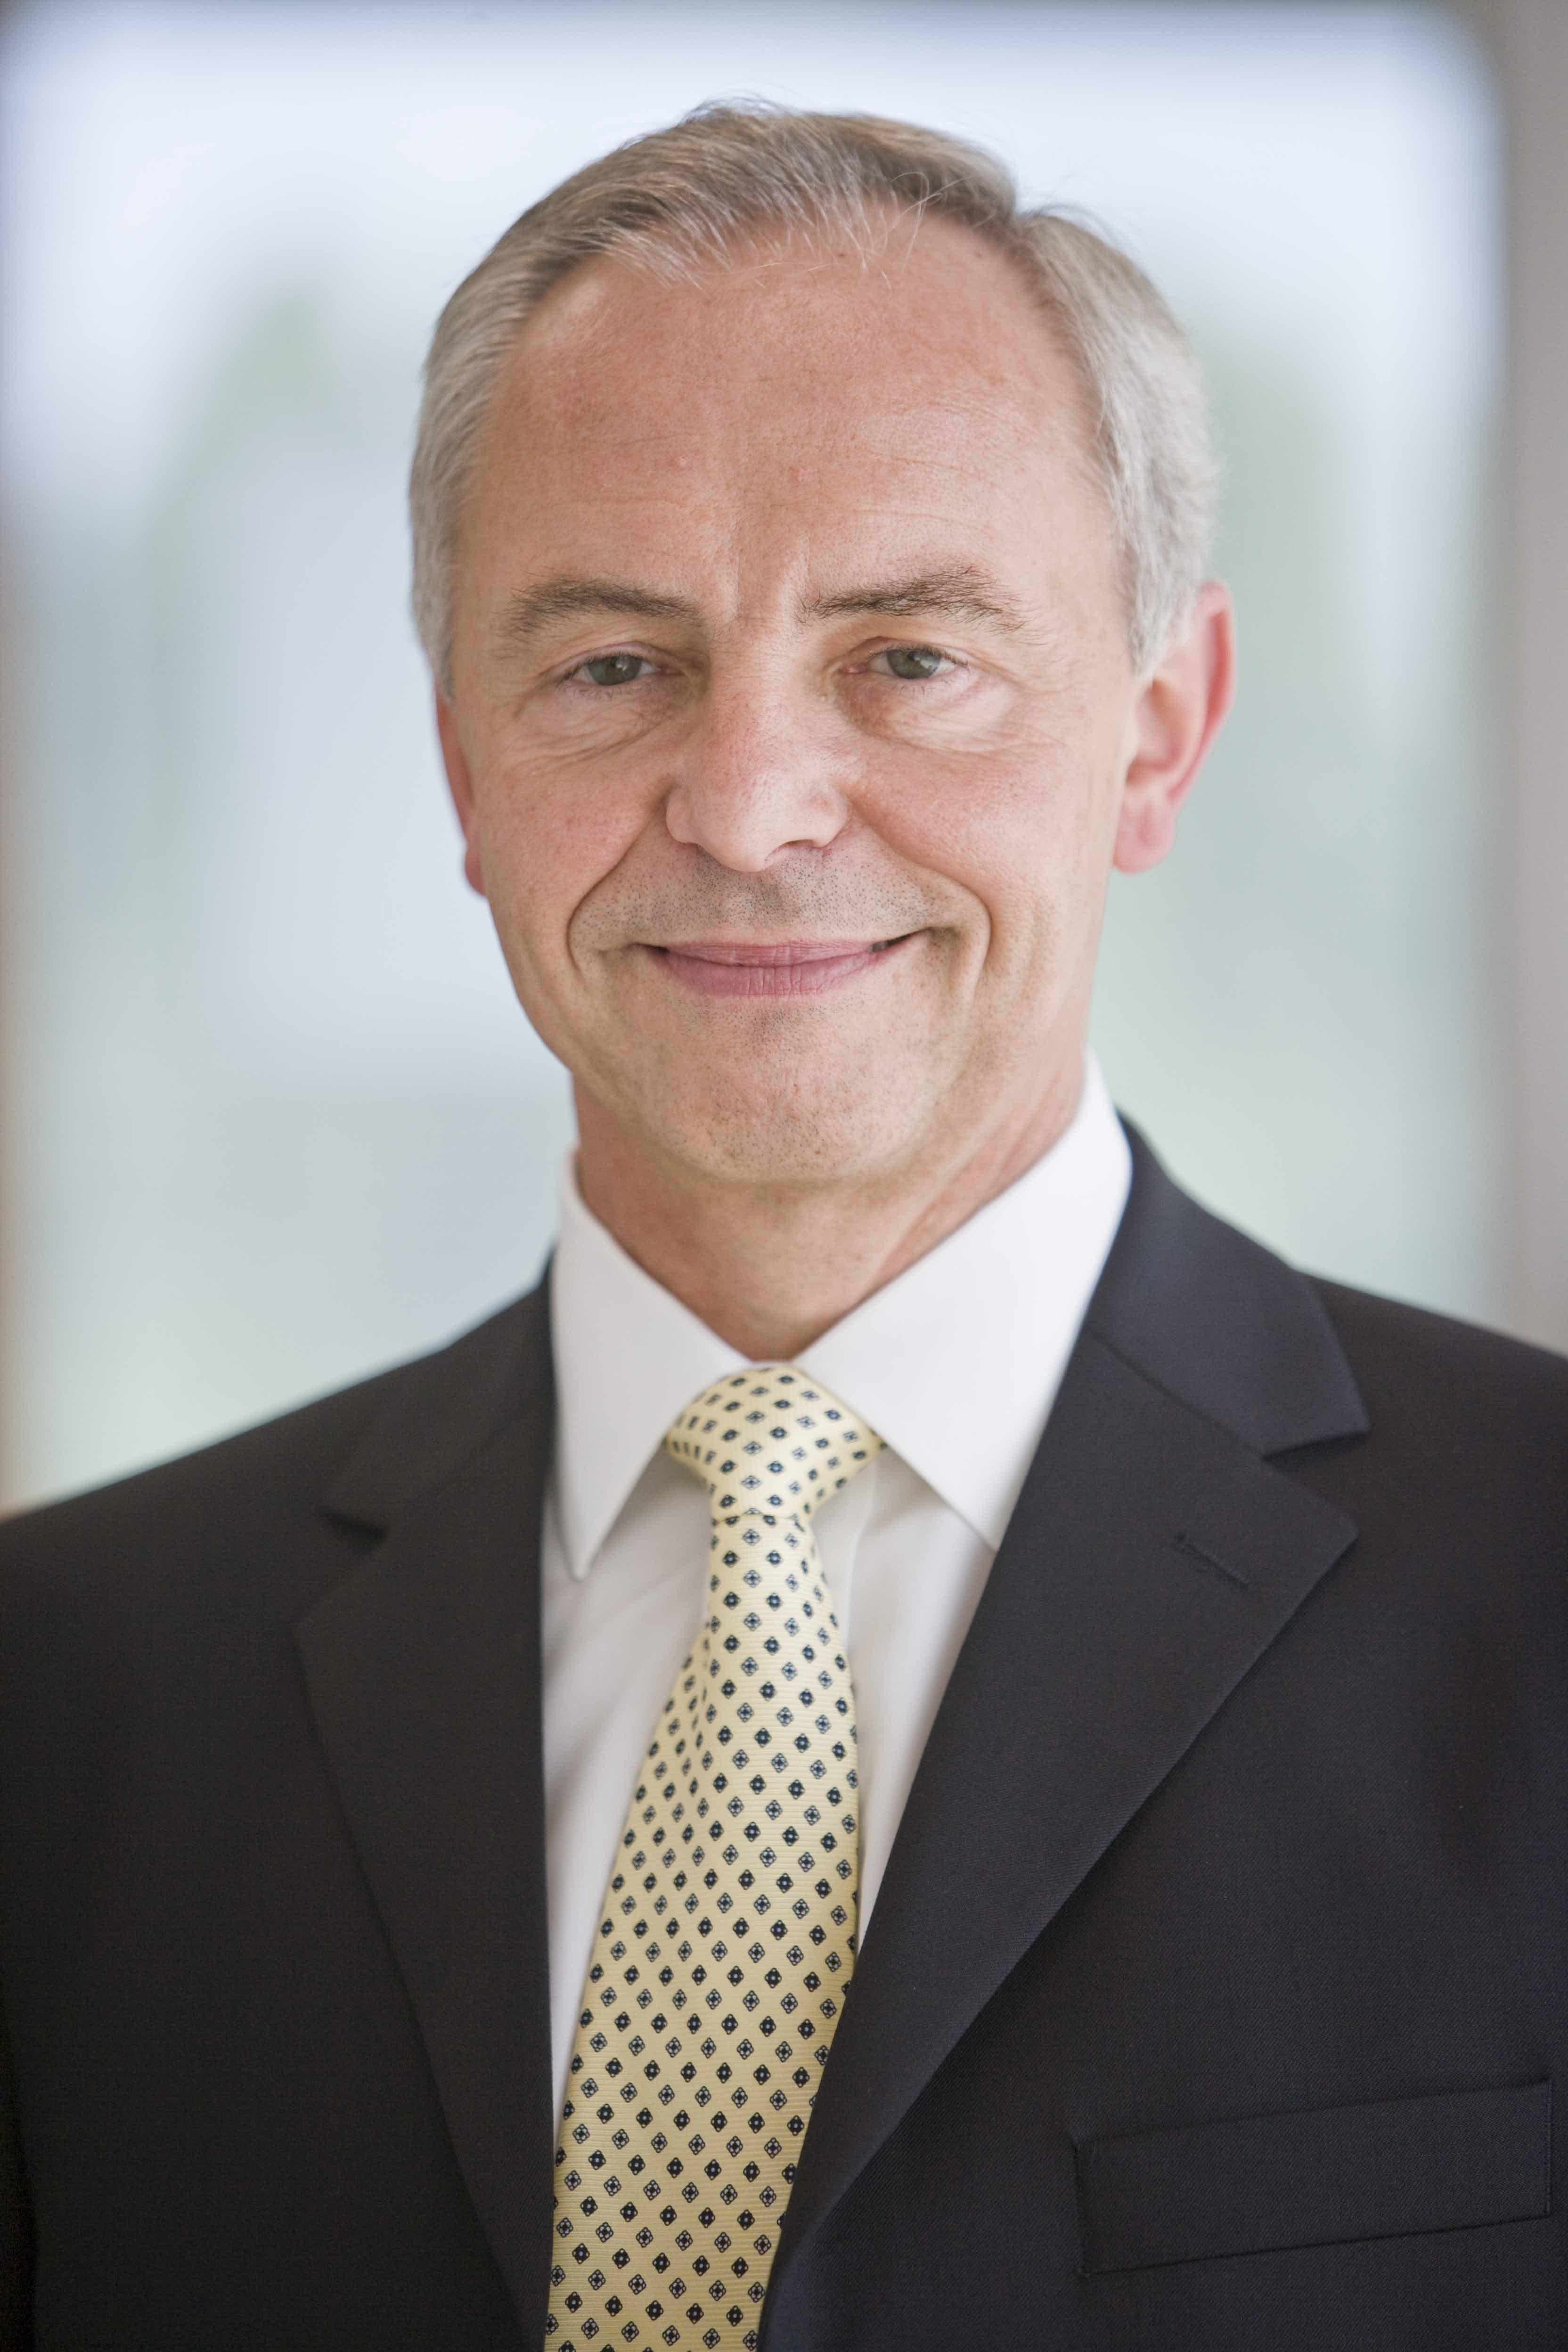 Kodak Alaris Announces Appointments to Board of Directors